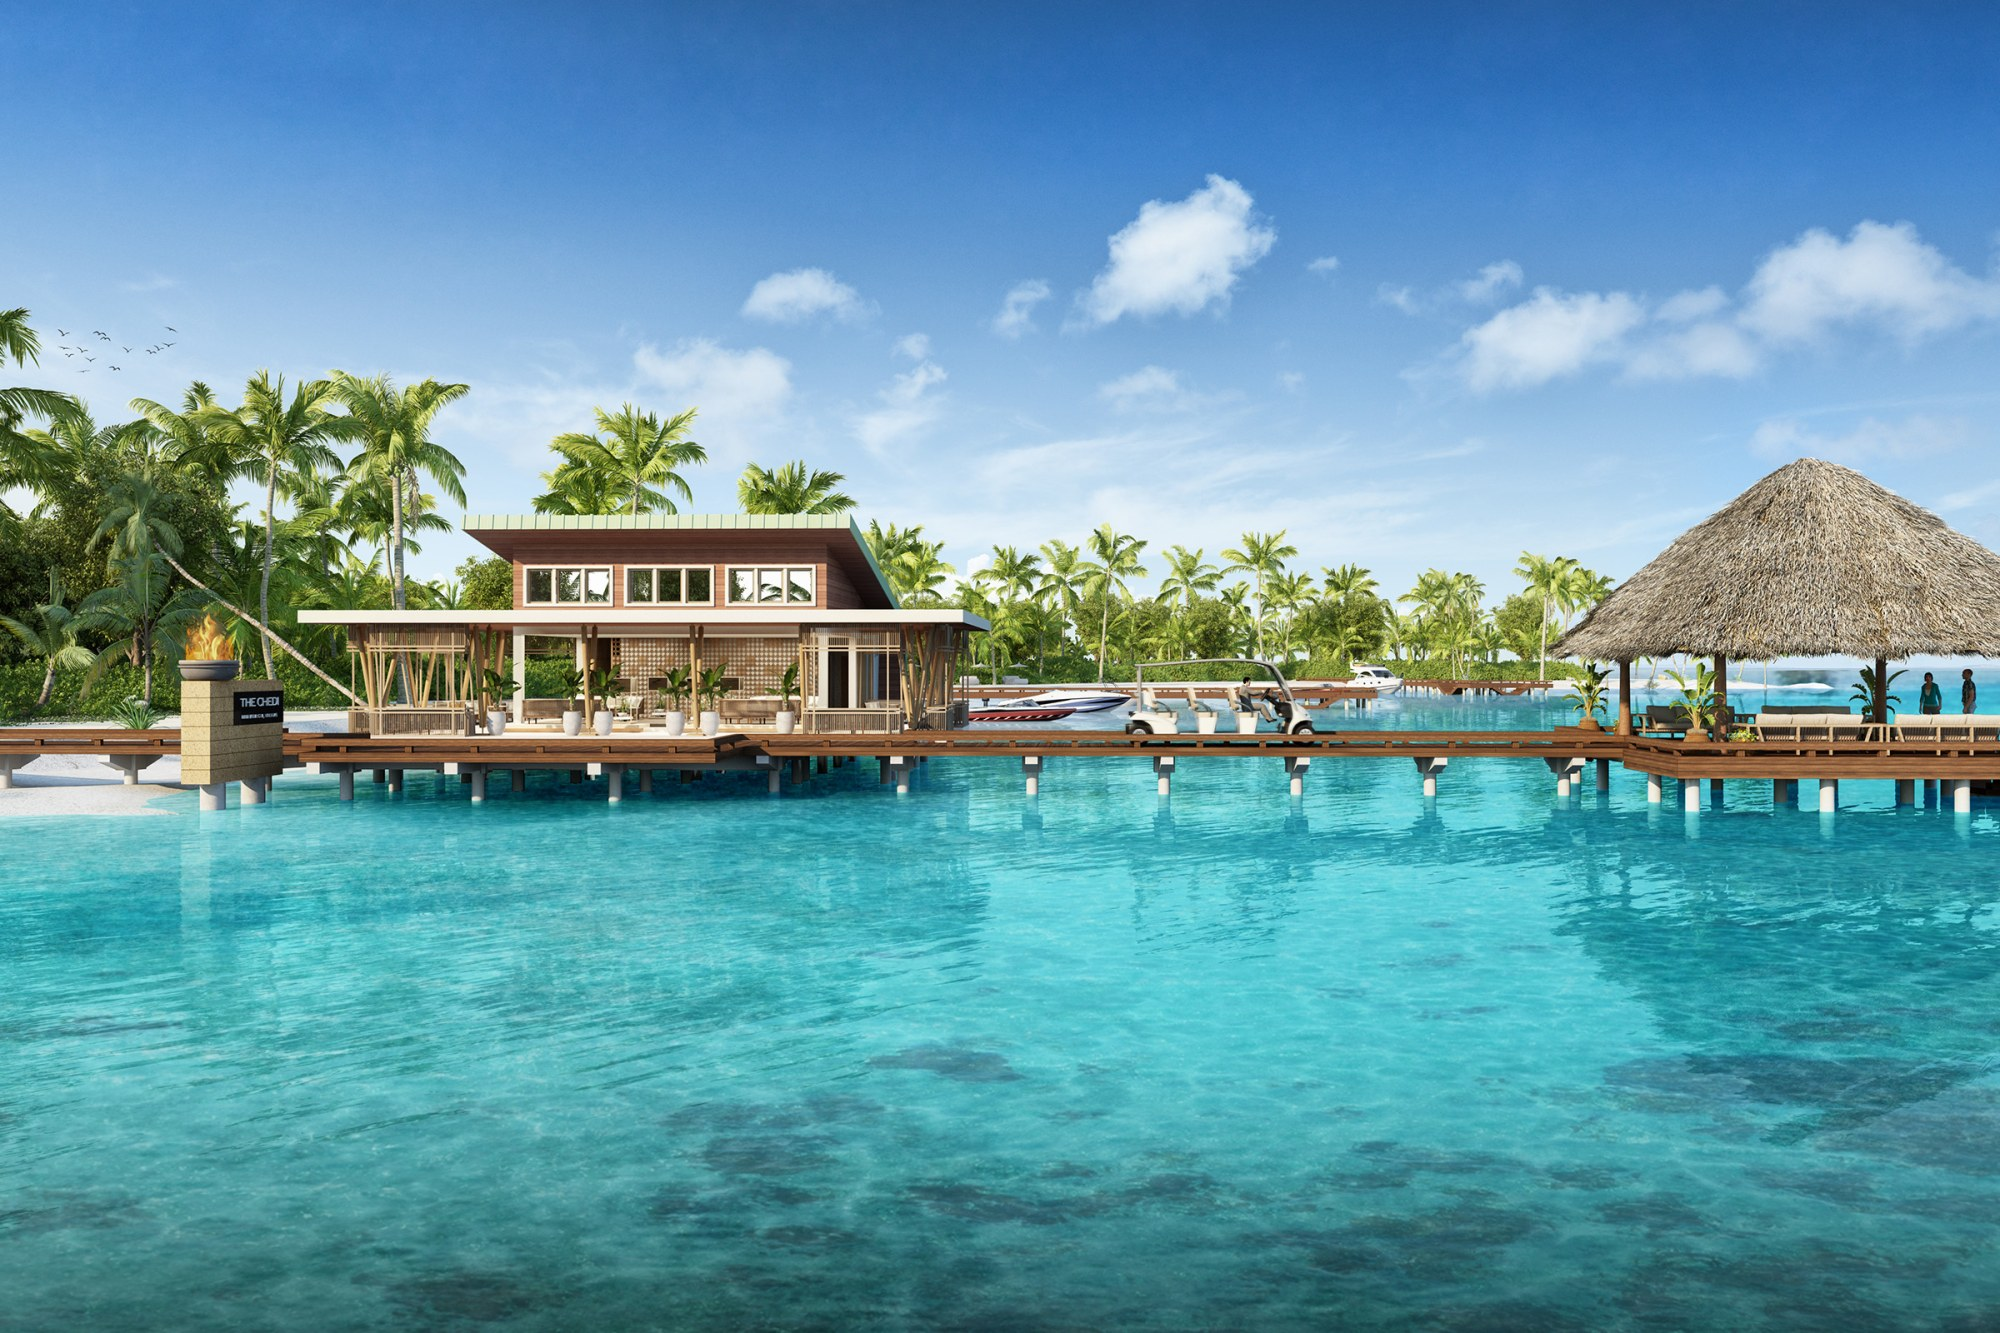 The Chedi Kudavillingili, Maldives (GHM Hotels)